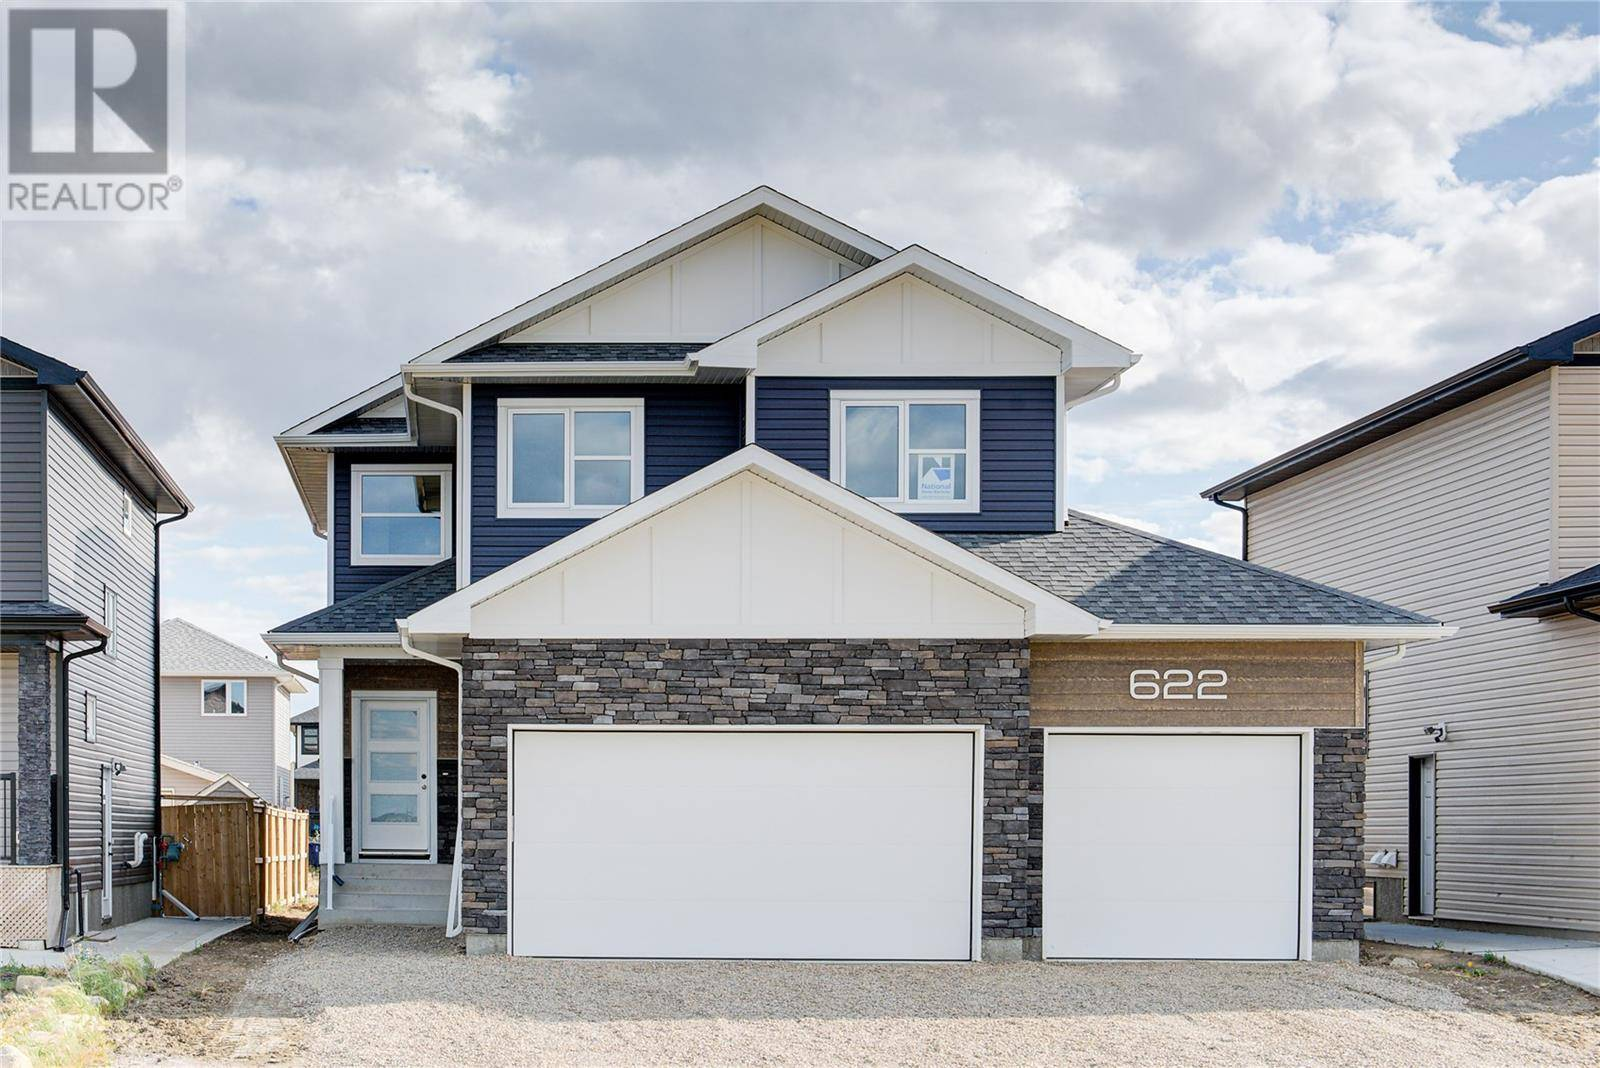 House for sale at 622 Boykowich Cres Saskatoon Saskatchewan - MLS: SK785172